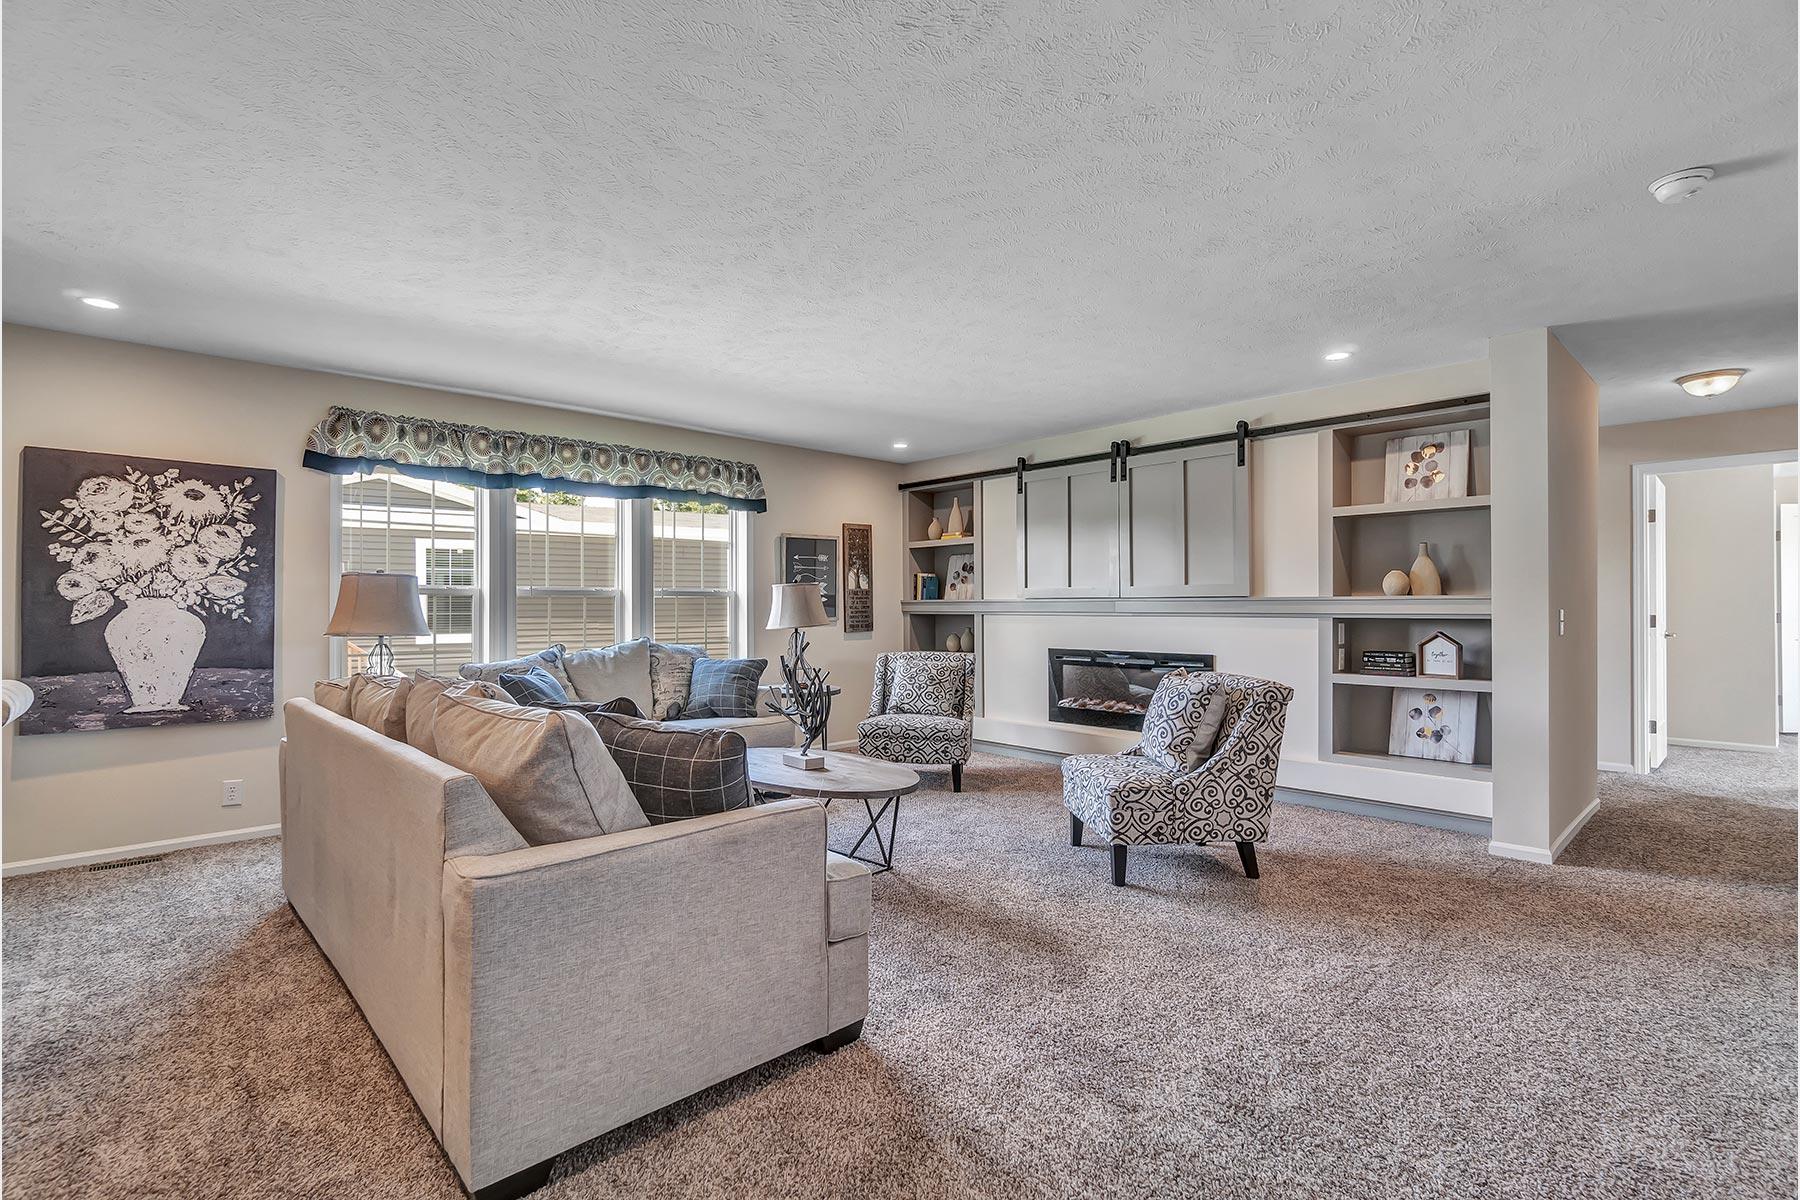 Champion 3276 211 Living Room 1